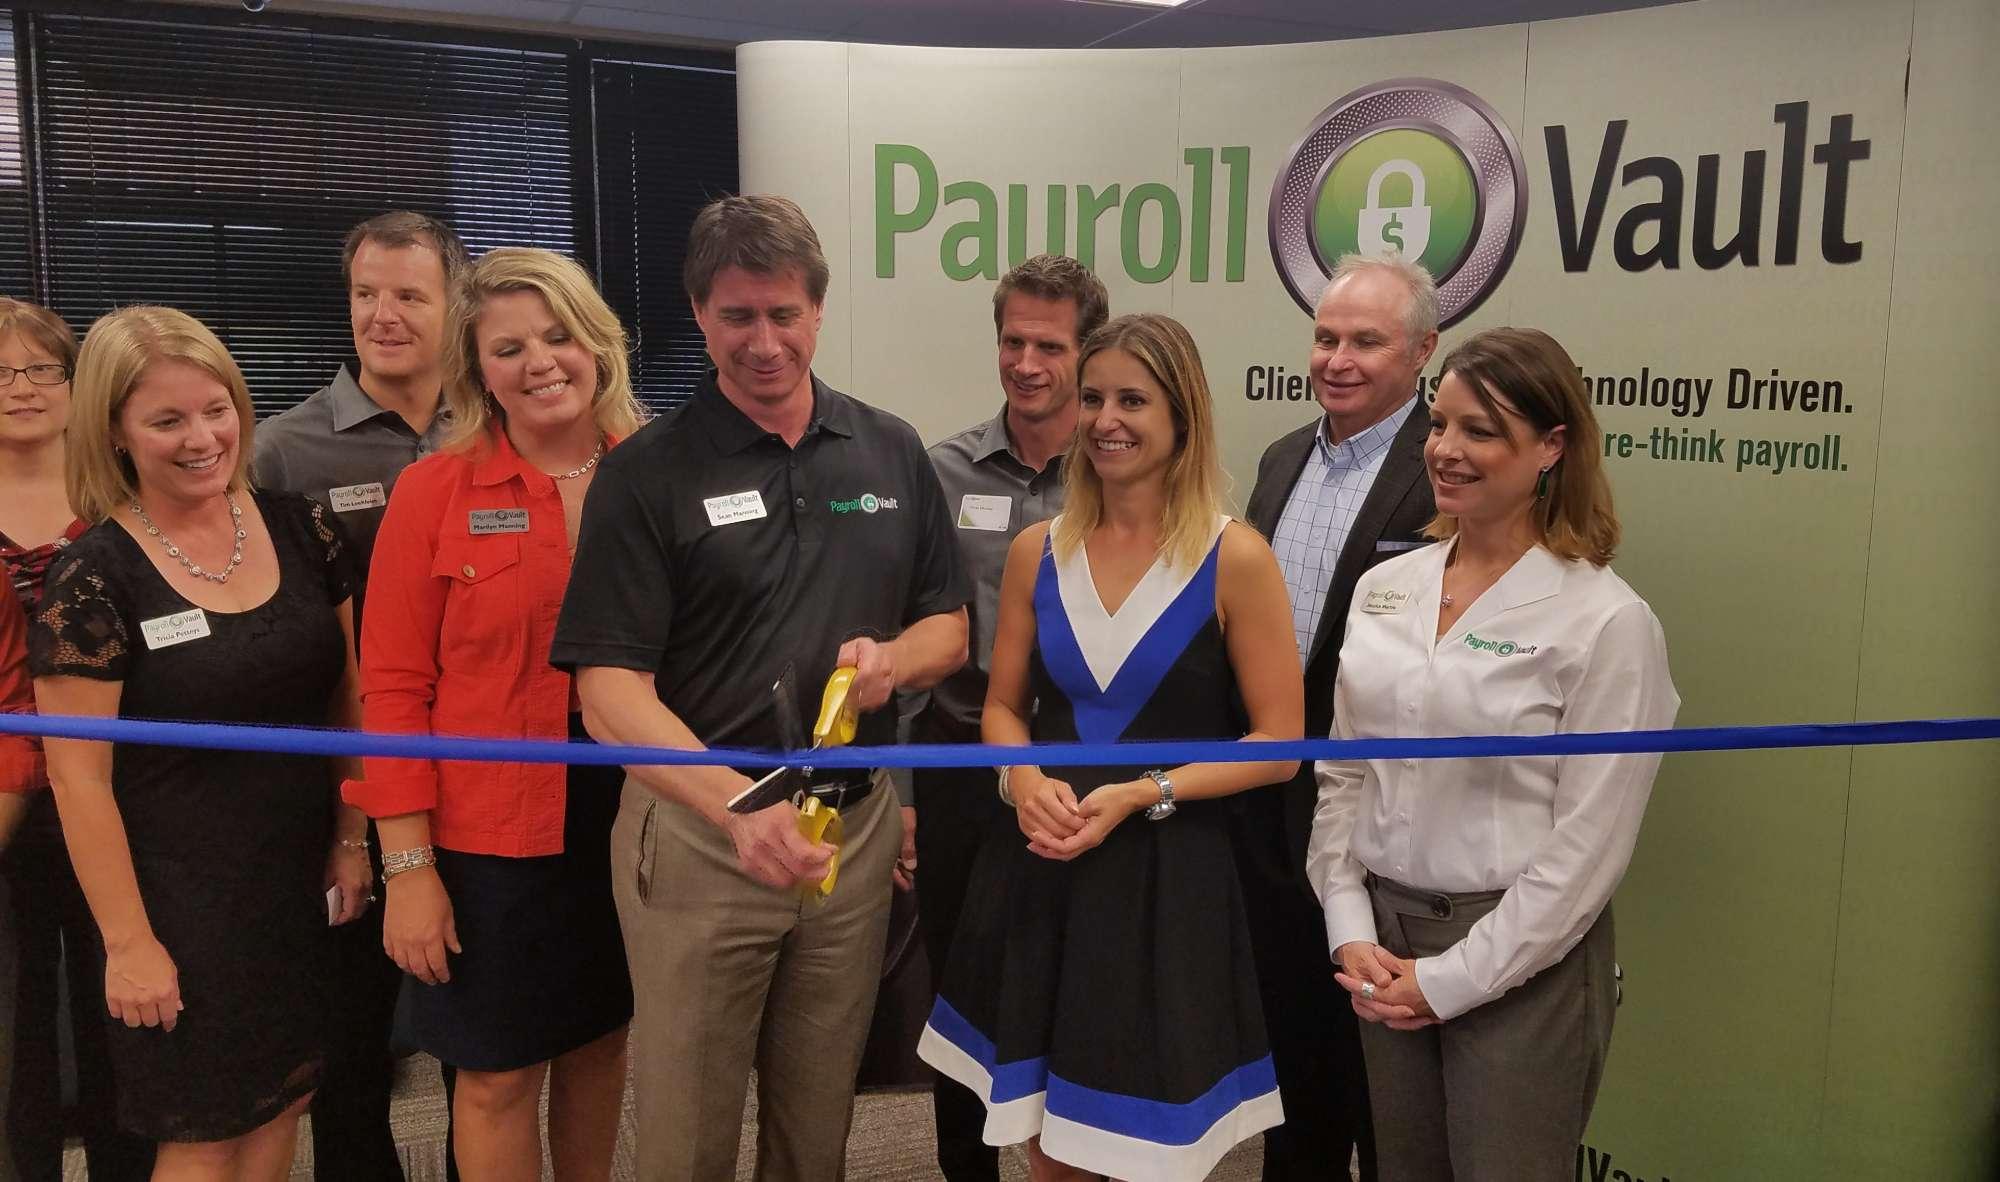 Sean Manning and Payroll Vault team at ribbon cutting